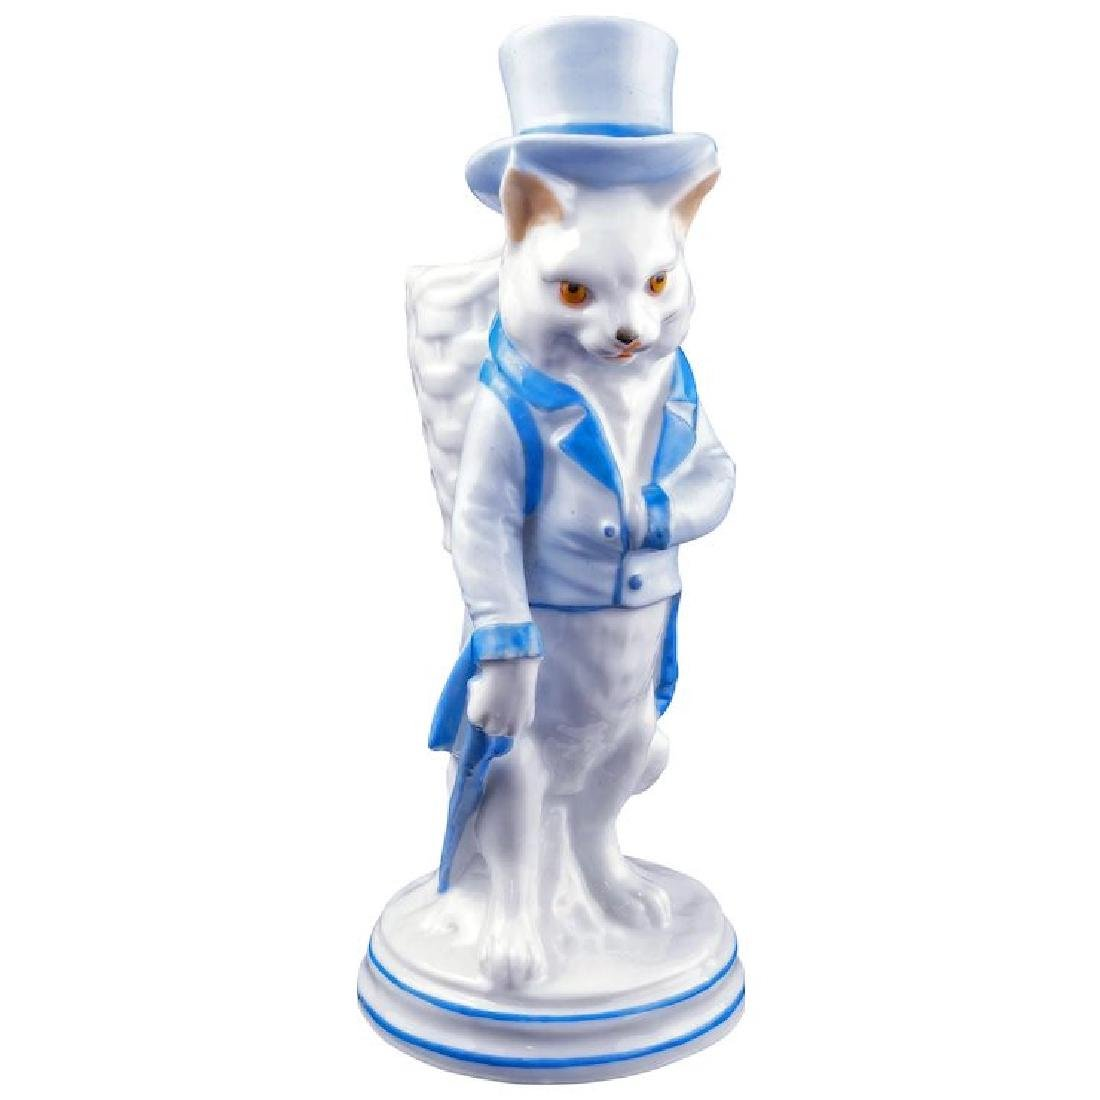 Antique German porcelain figure of gentleman cat match